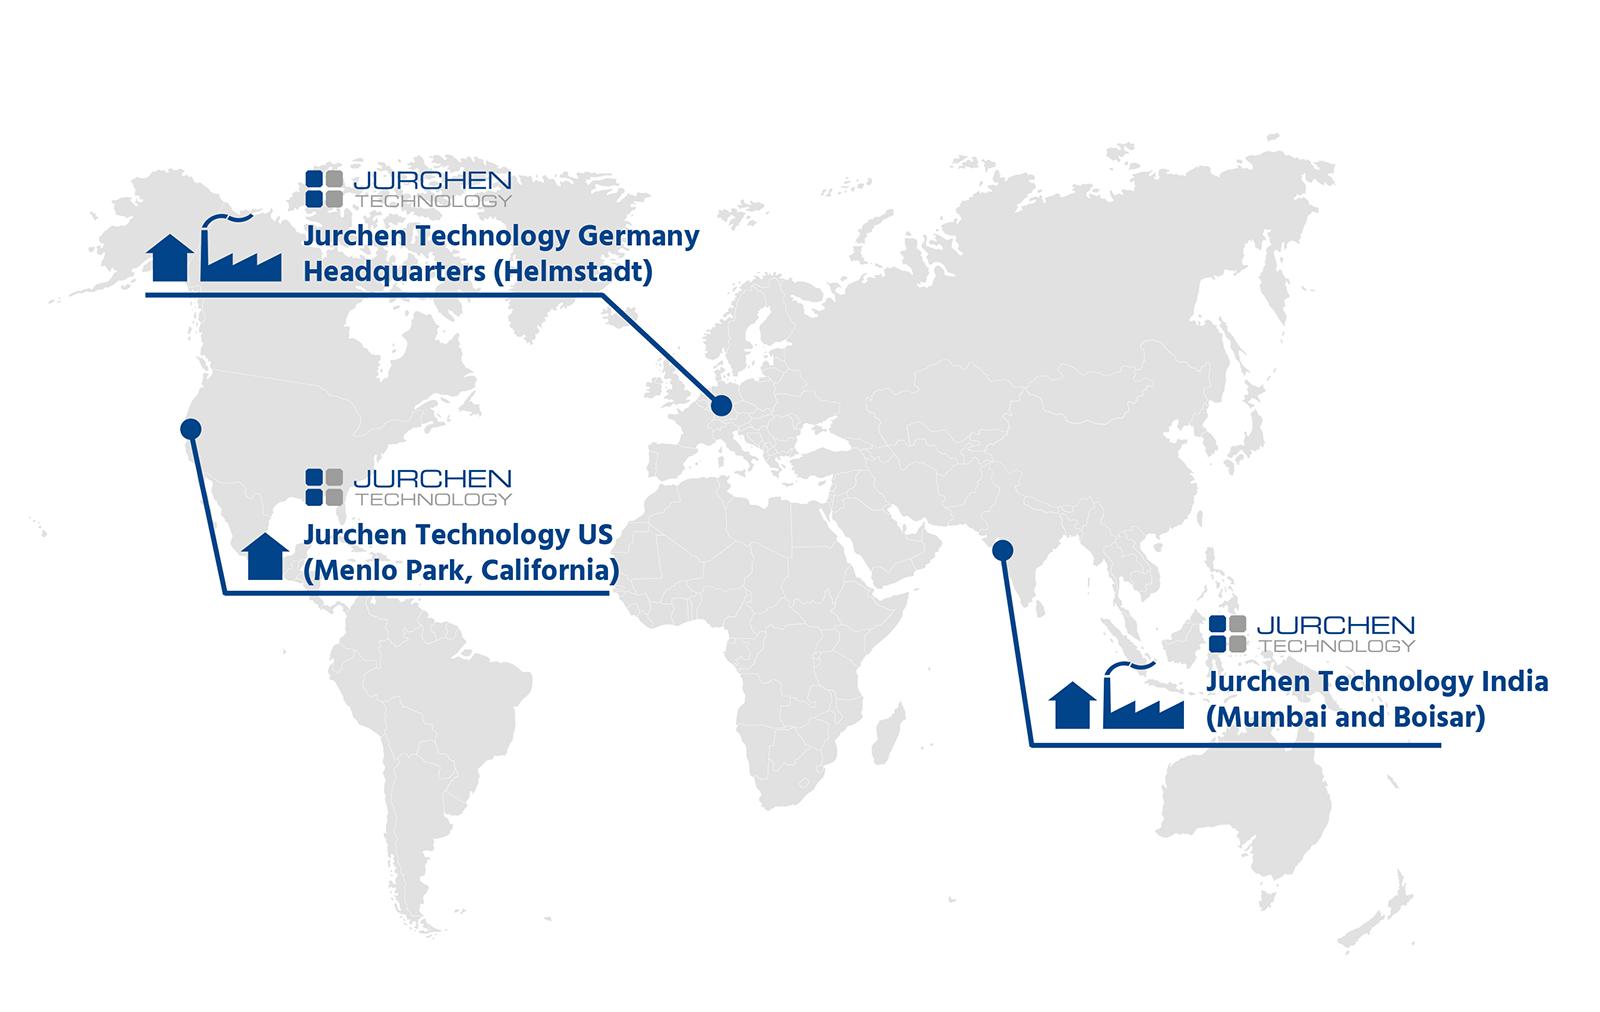 Jurchen Technology Solar Worldmap